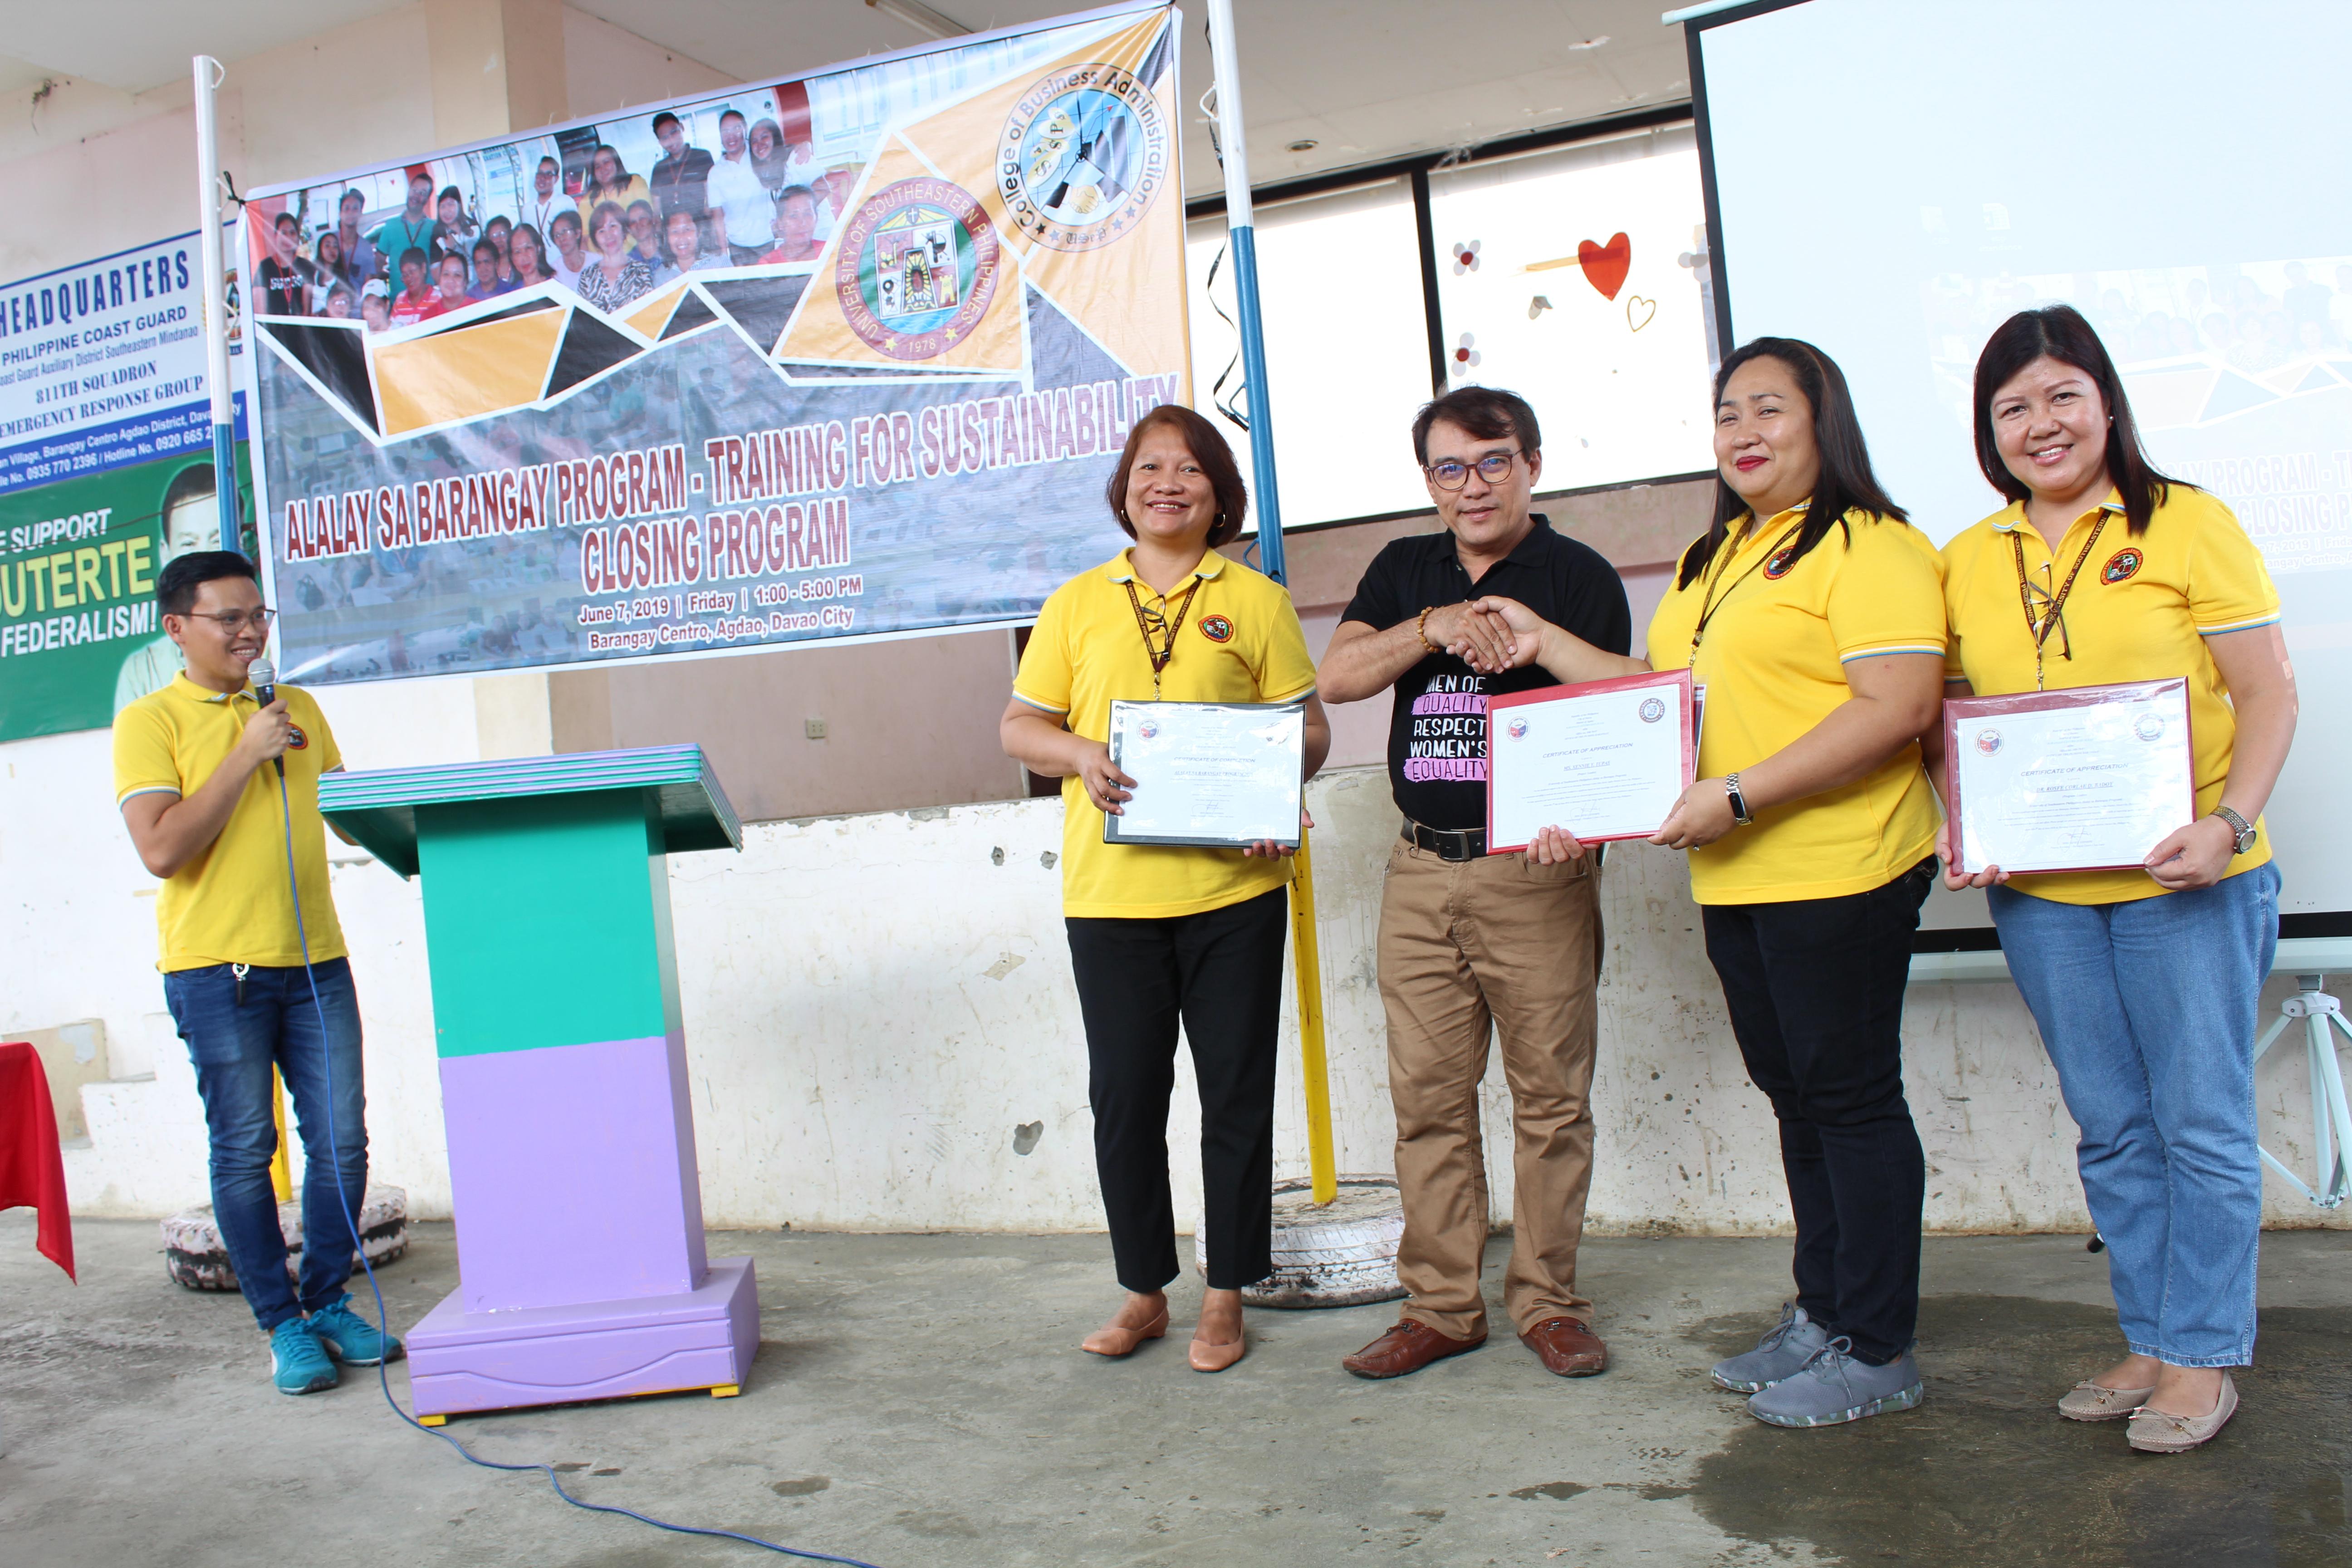 pb-estorpe-awards-certificates-to-cba-and-program-project-leaders